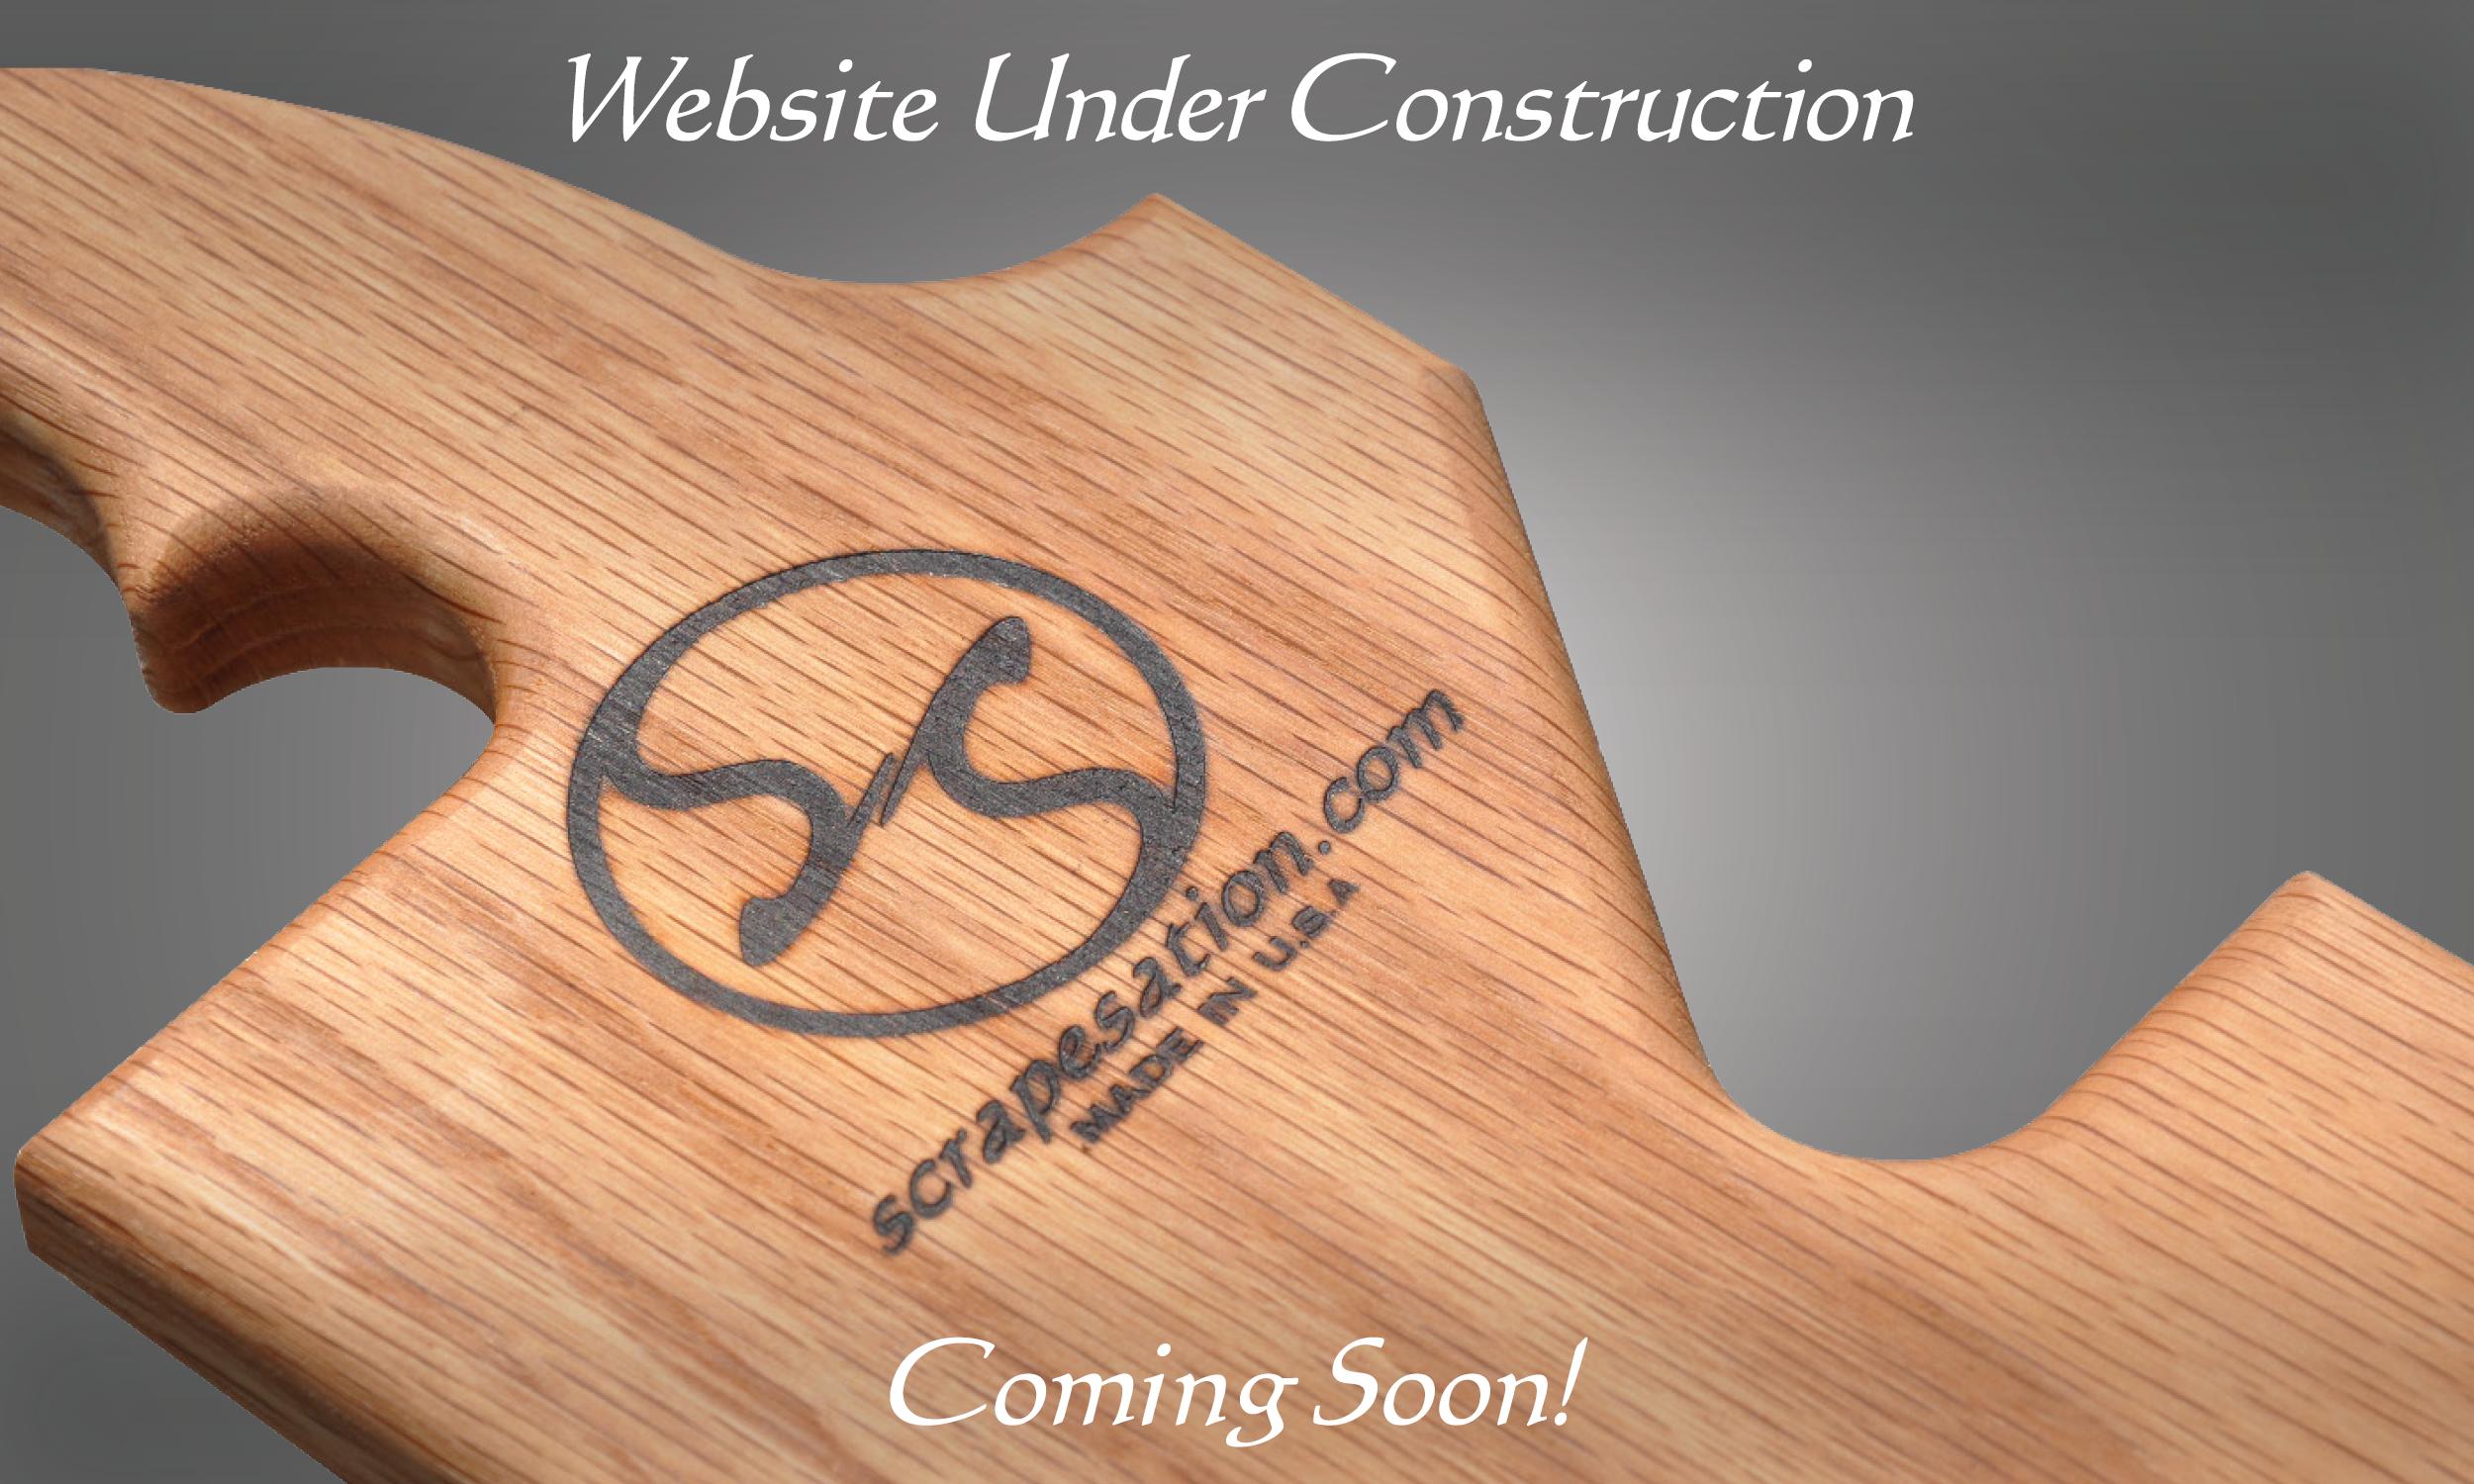 Scrapesation Website Under Construction. Coming Soon!